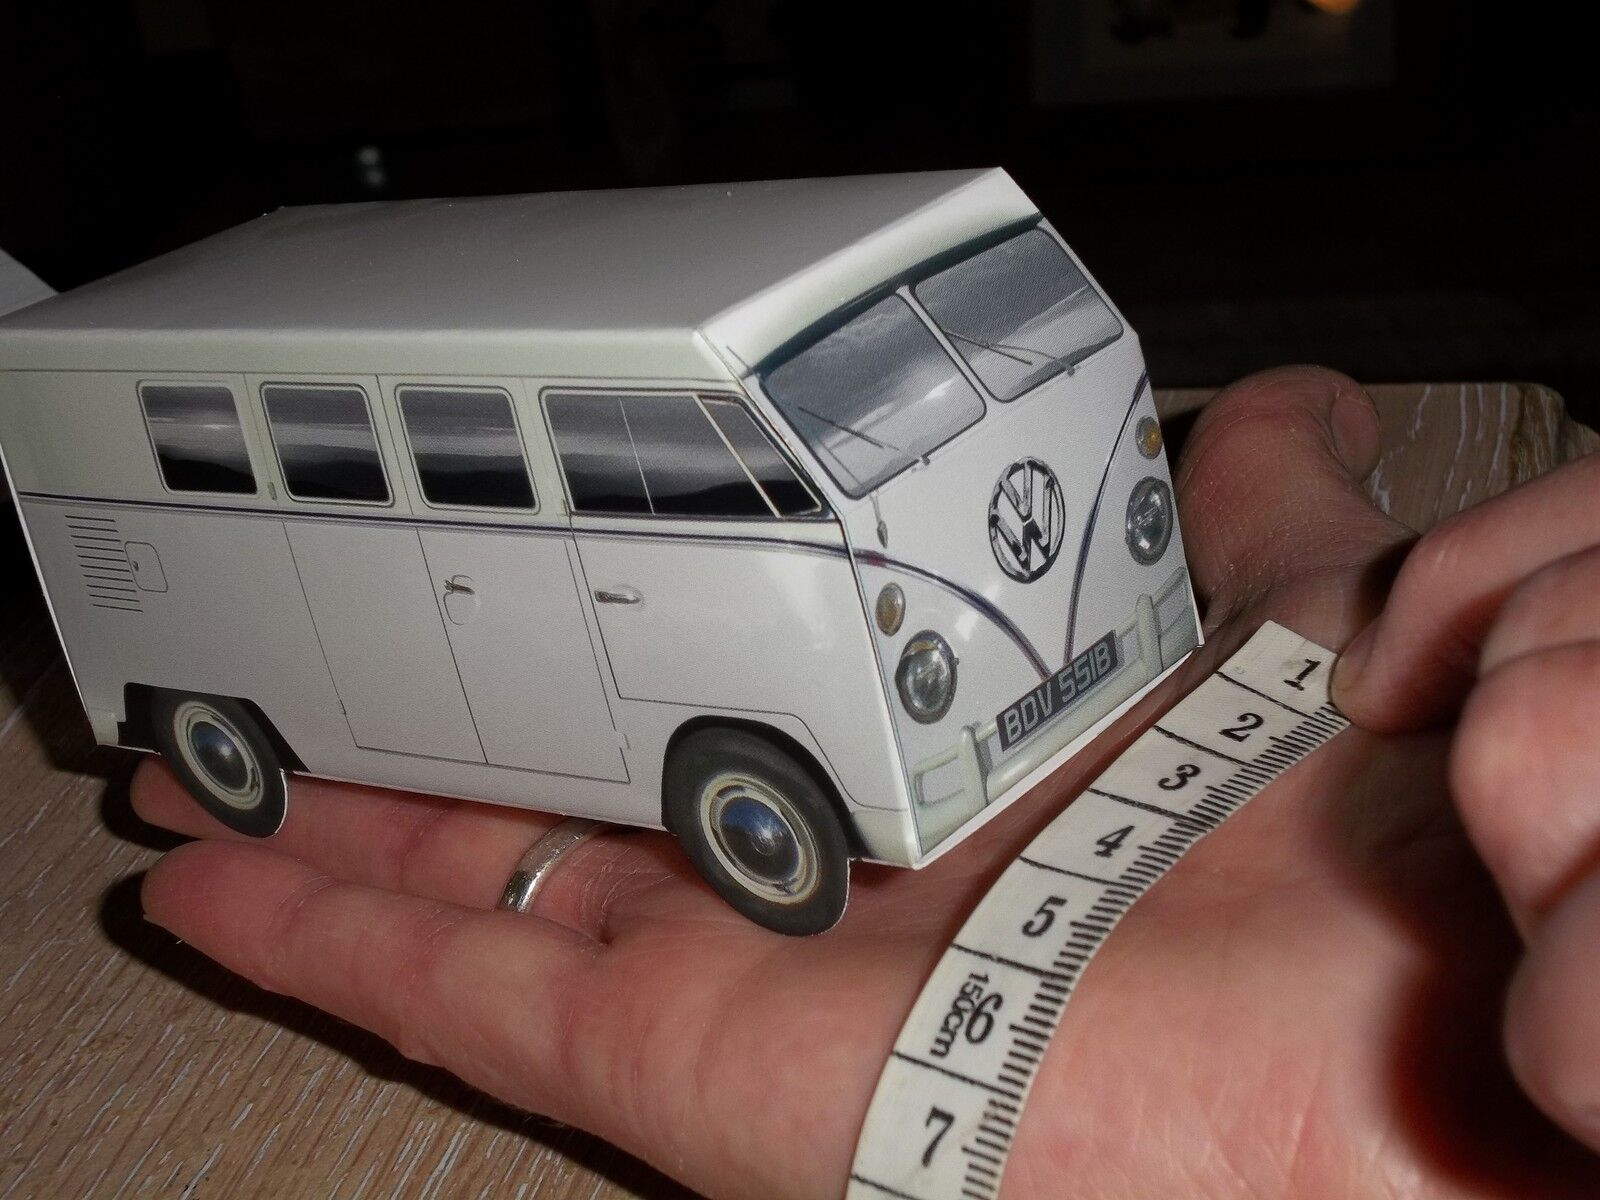 90 X Bianco VW Splitscreen Camper Van Van Van Nozze Favore VW Party Box Scatole Di Dolci 511e90